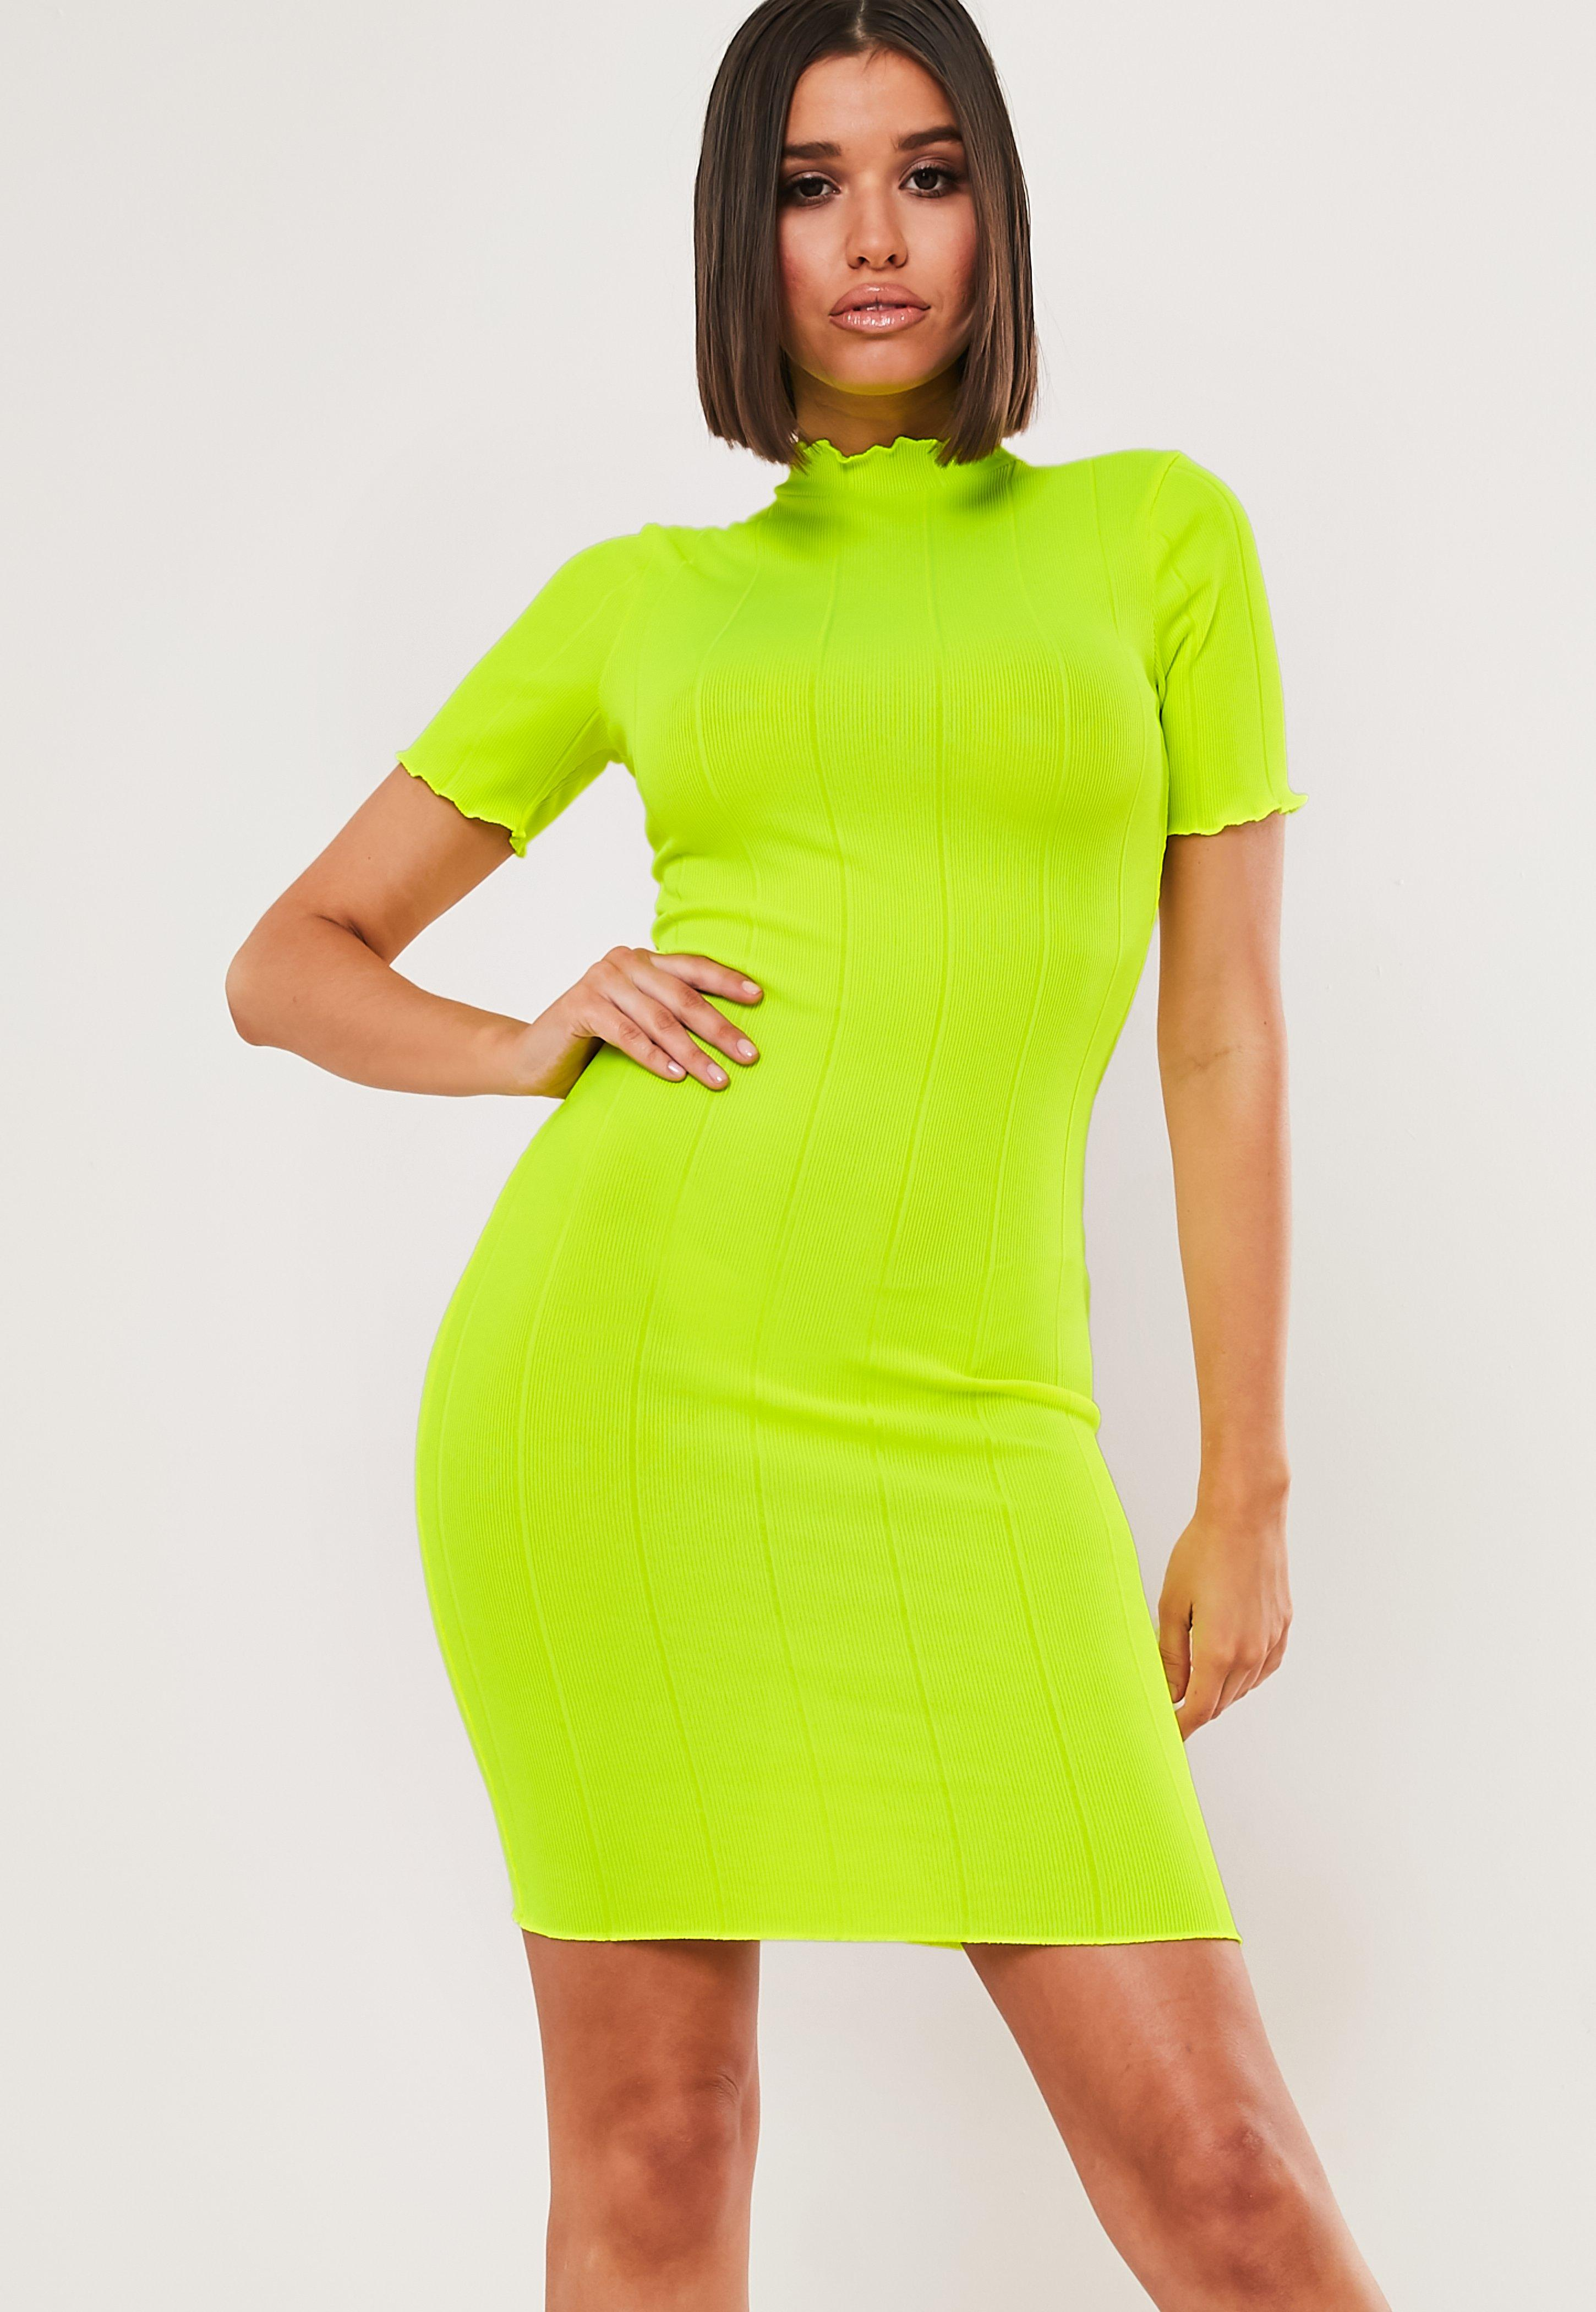 46fbe6264d Yellow Dresses